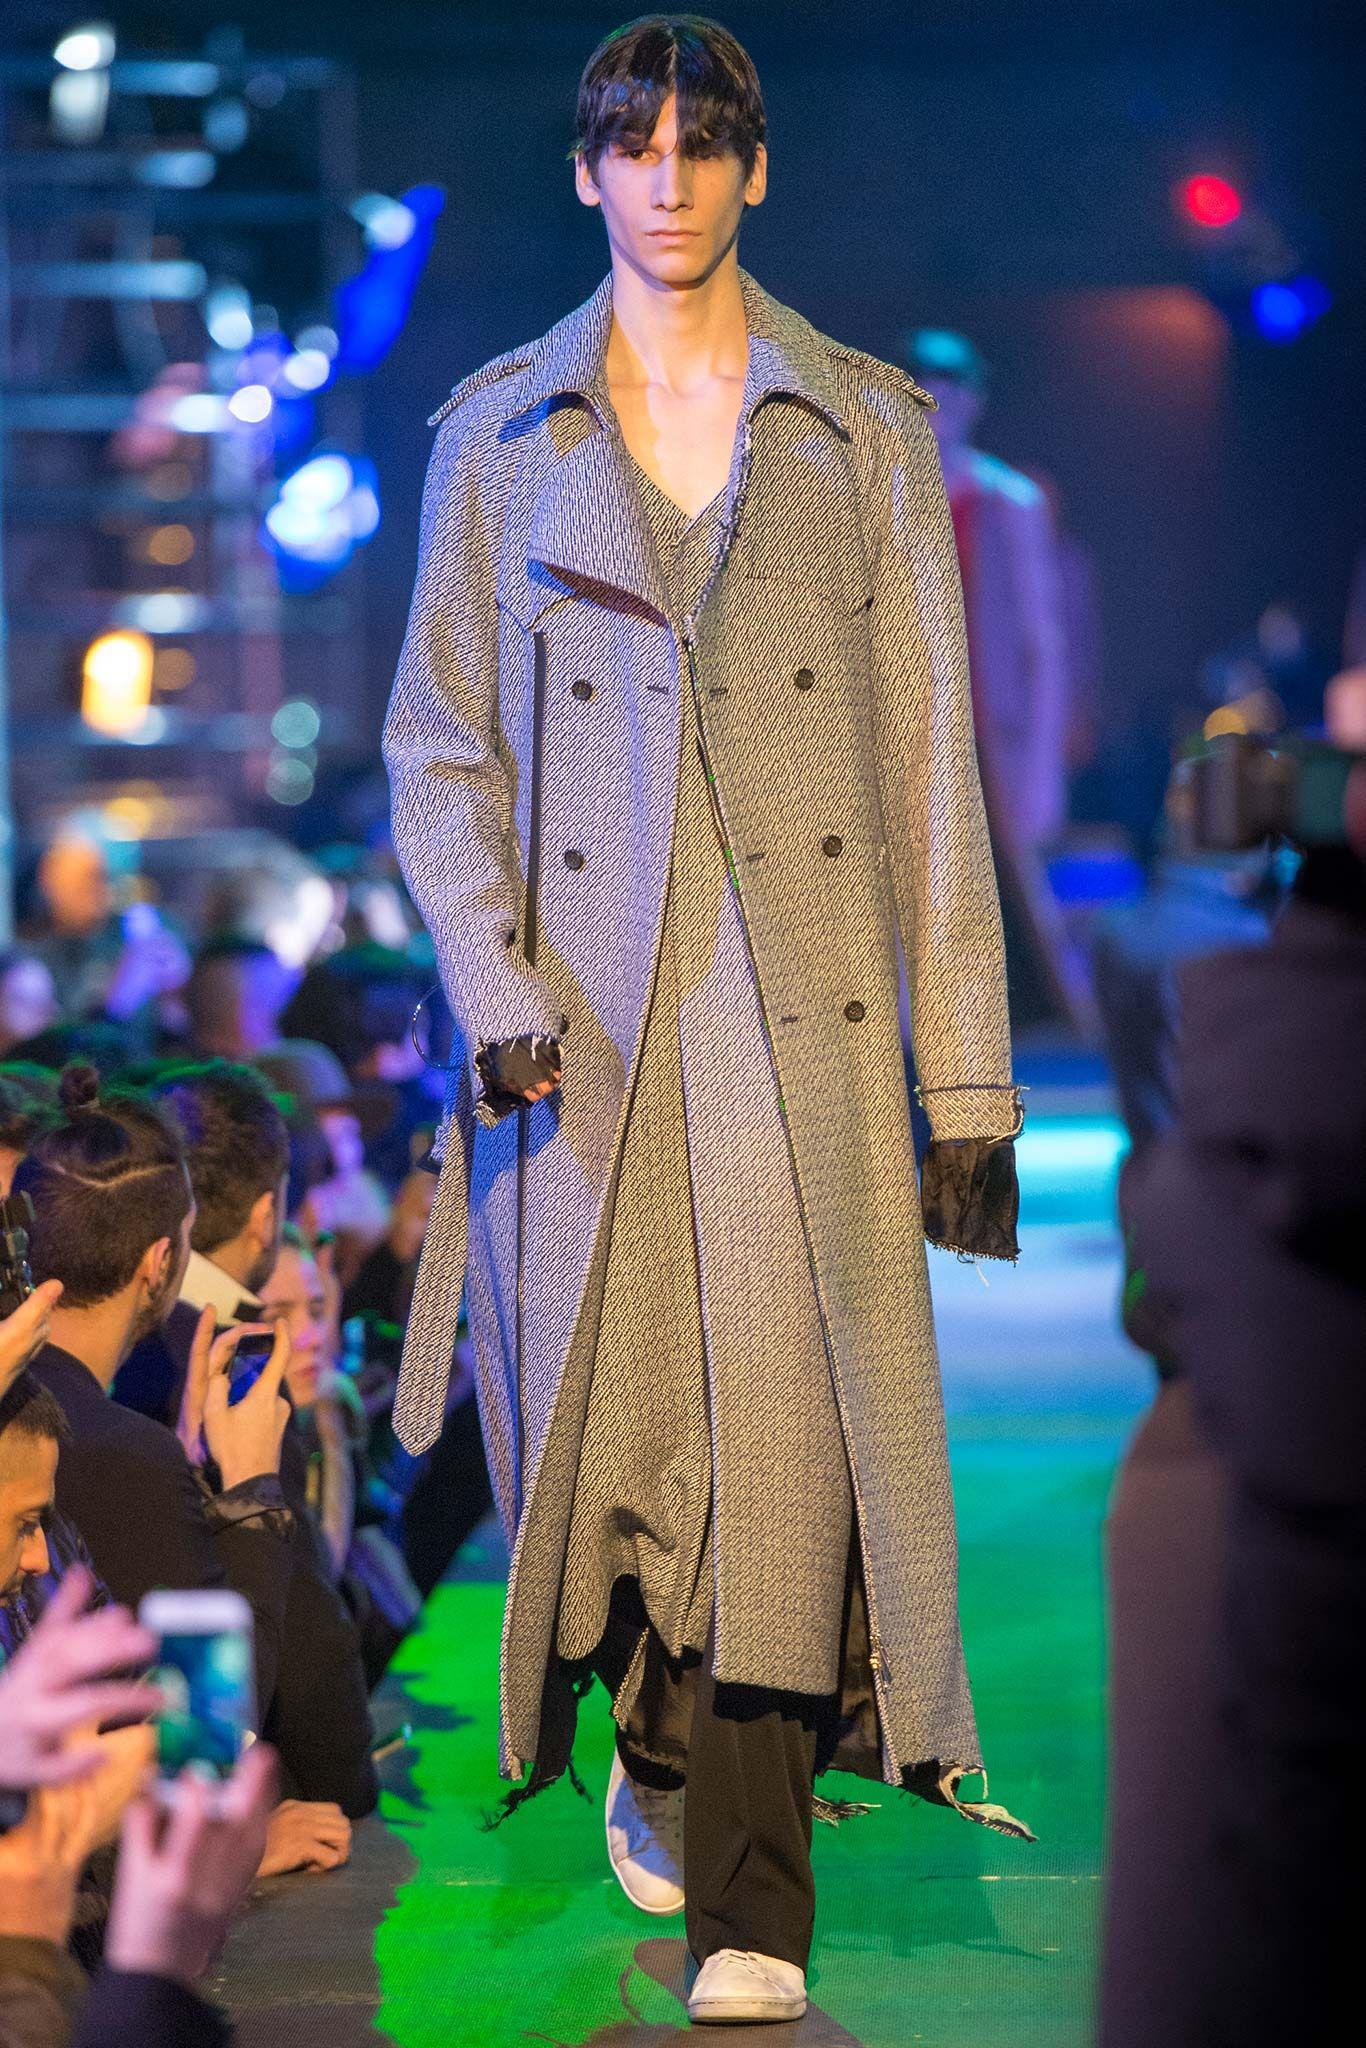 Raf Simons - Fall 2015 Menswear - Look 19 of 42